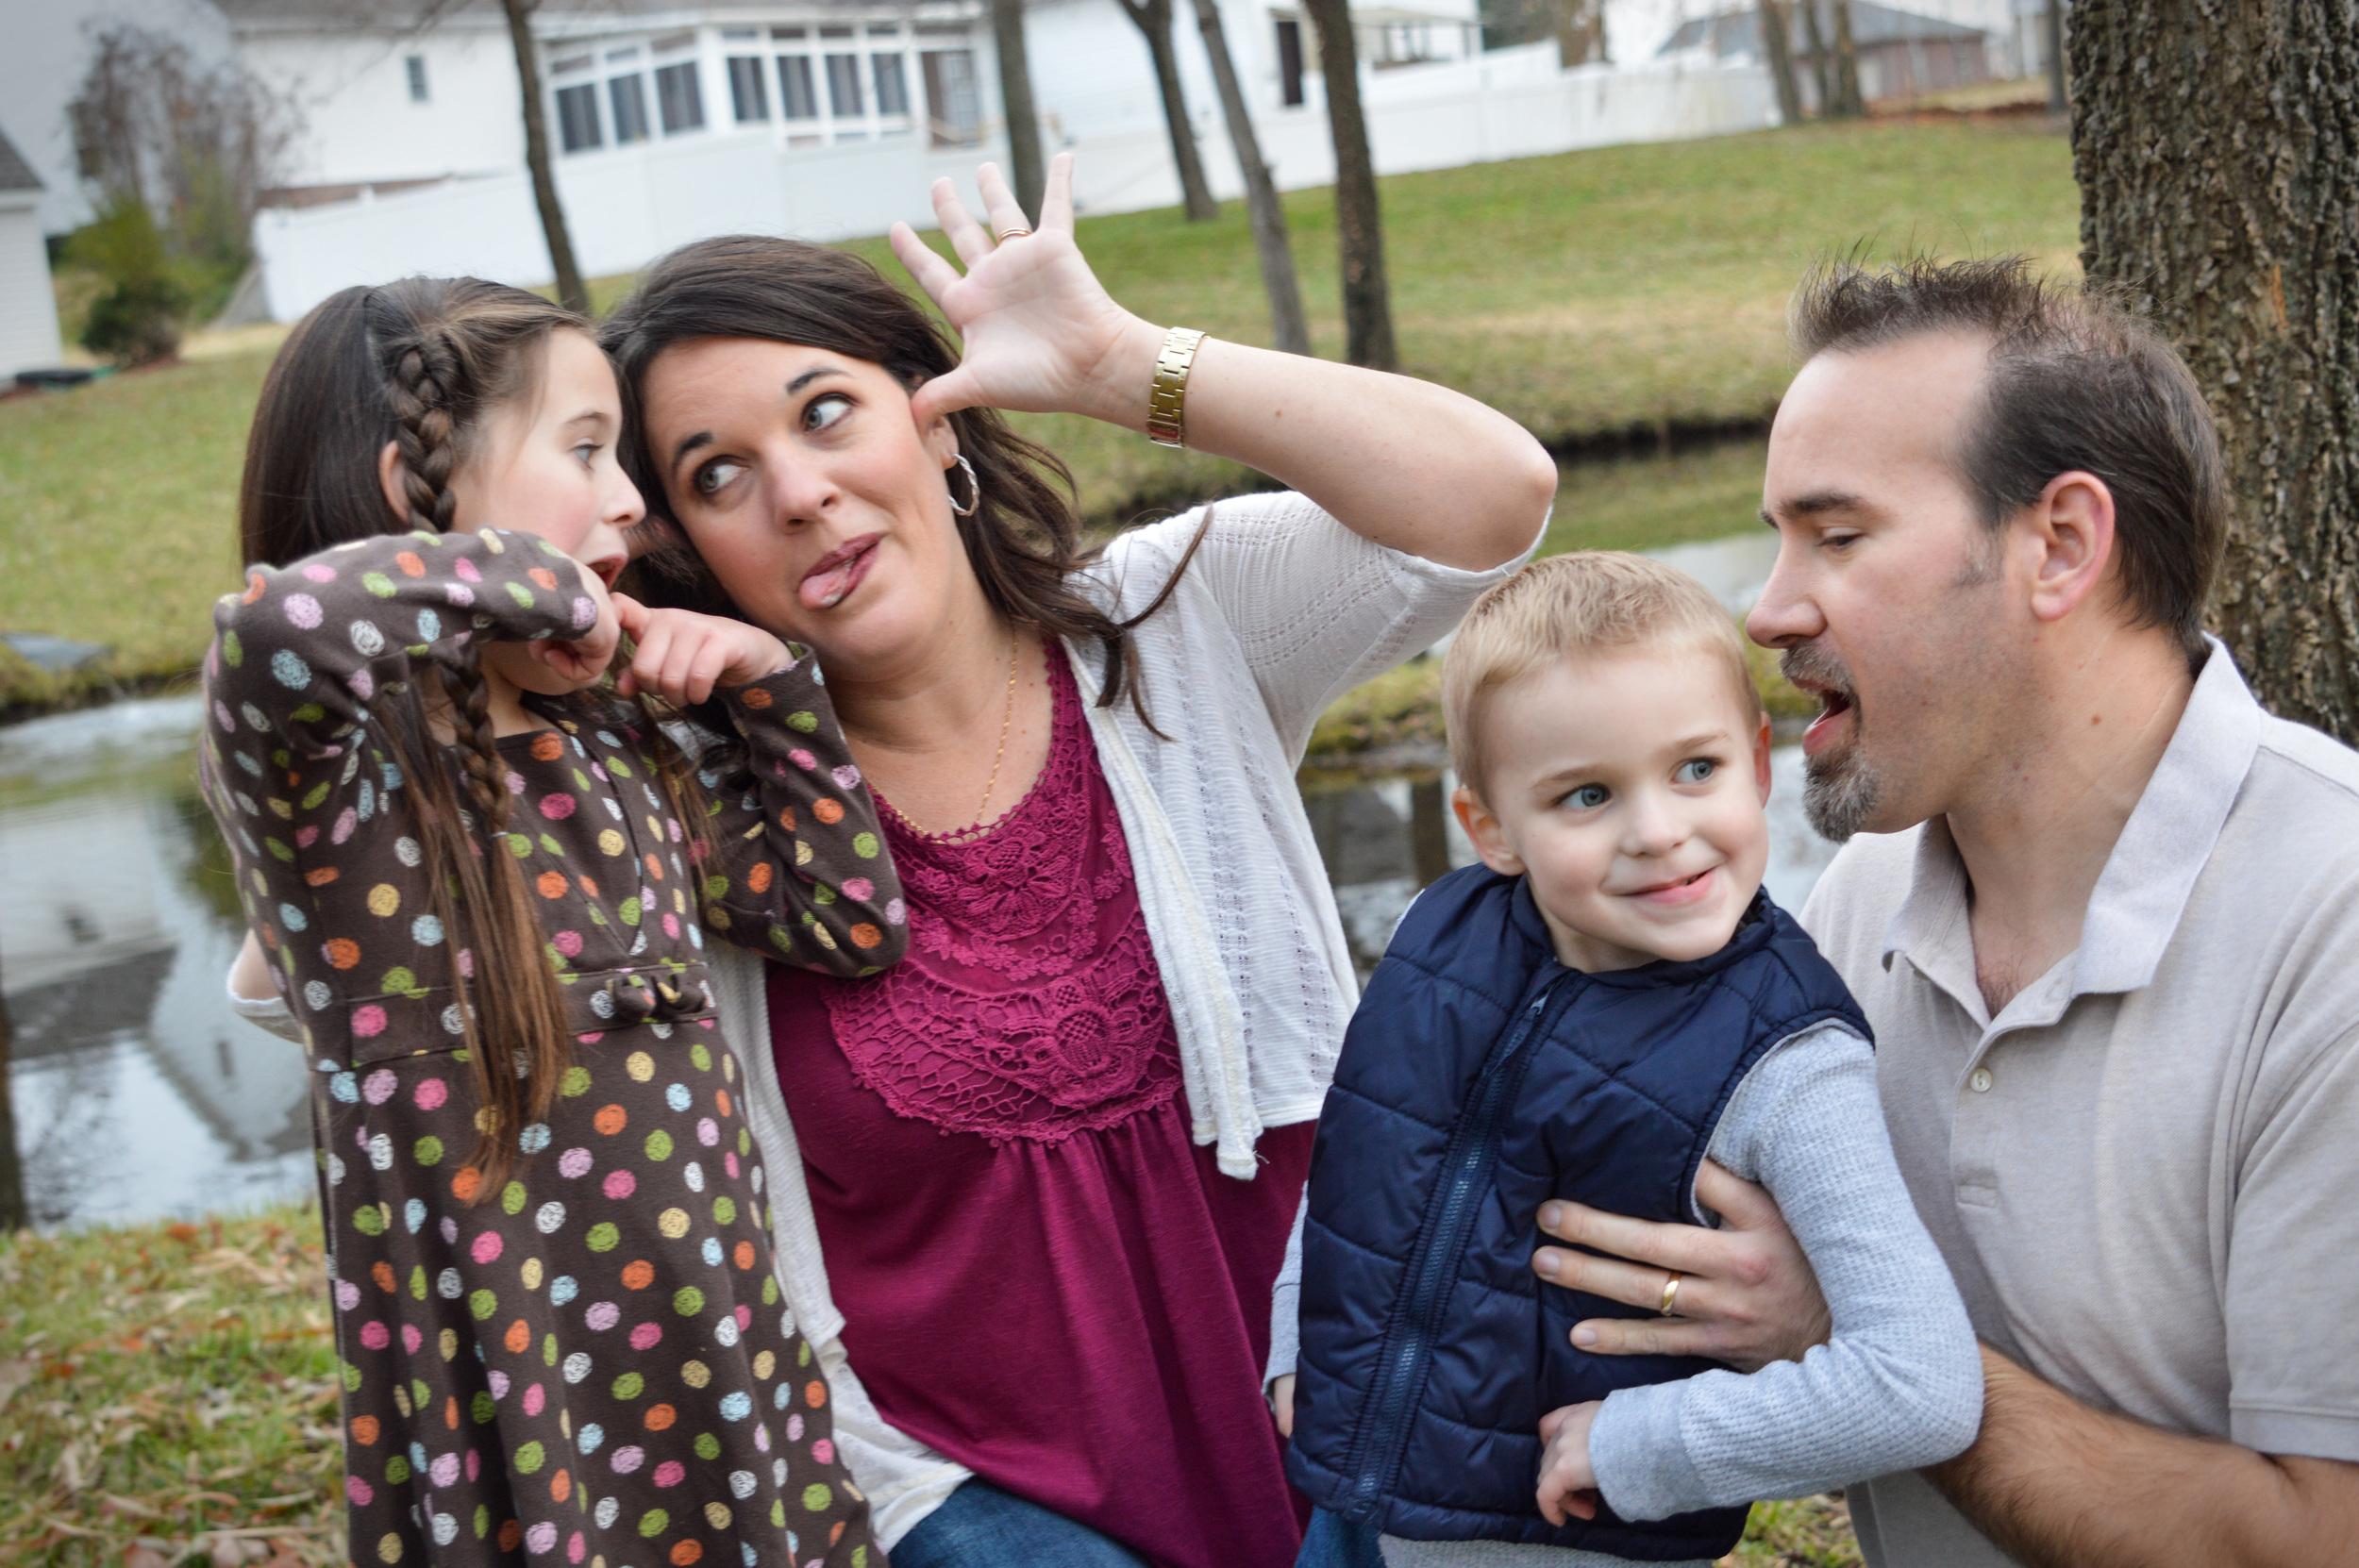 sillyfamilyphoto-familyportraits-familyphotography-joplinmissouri-photosbyariel